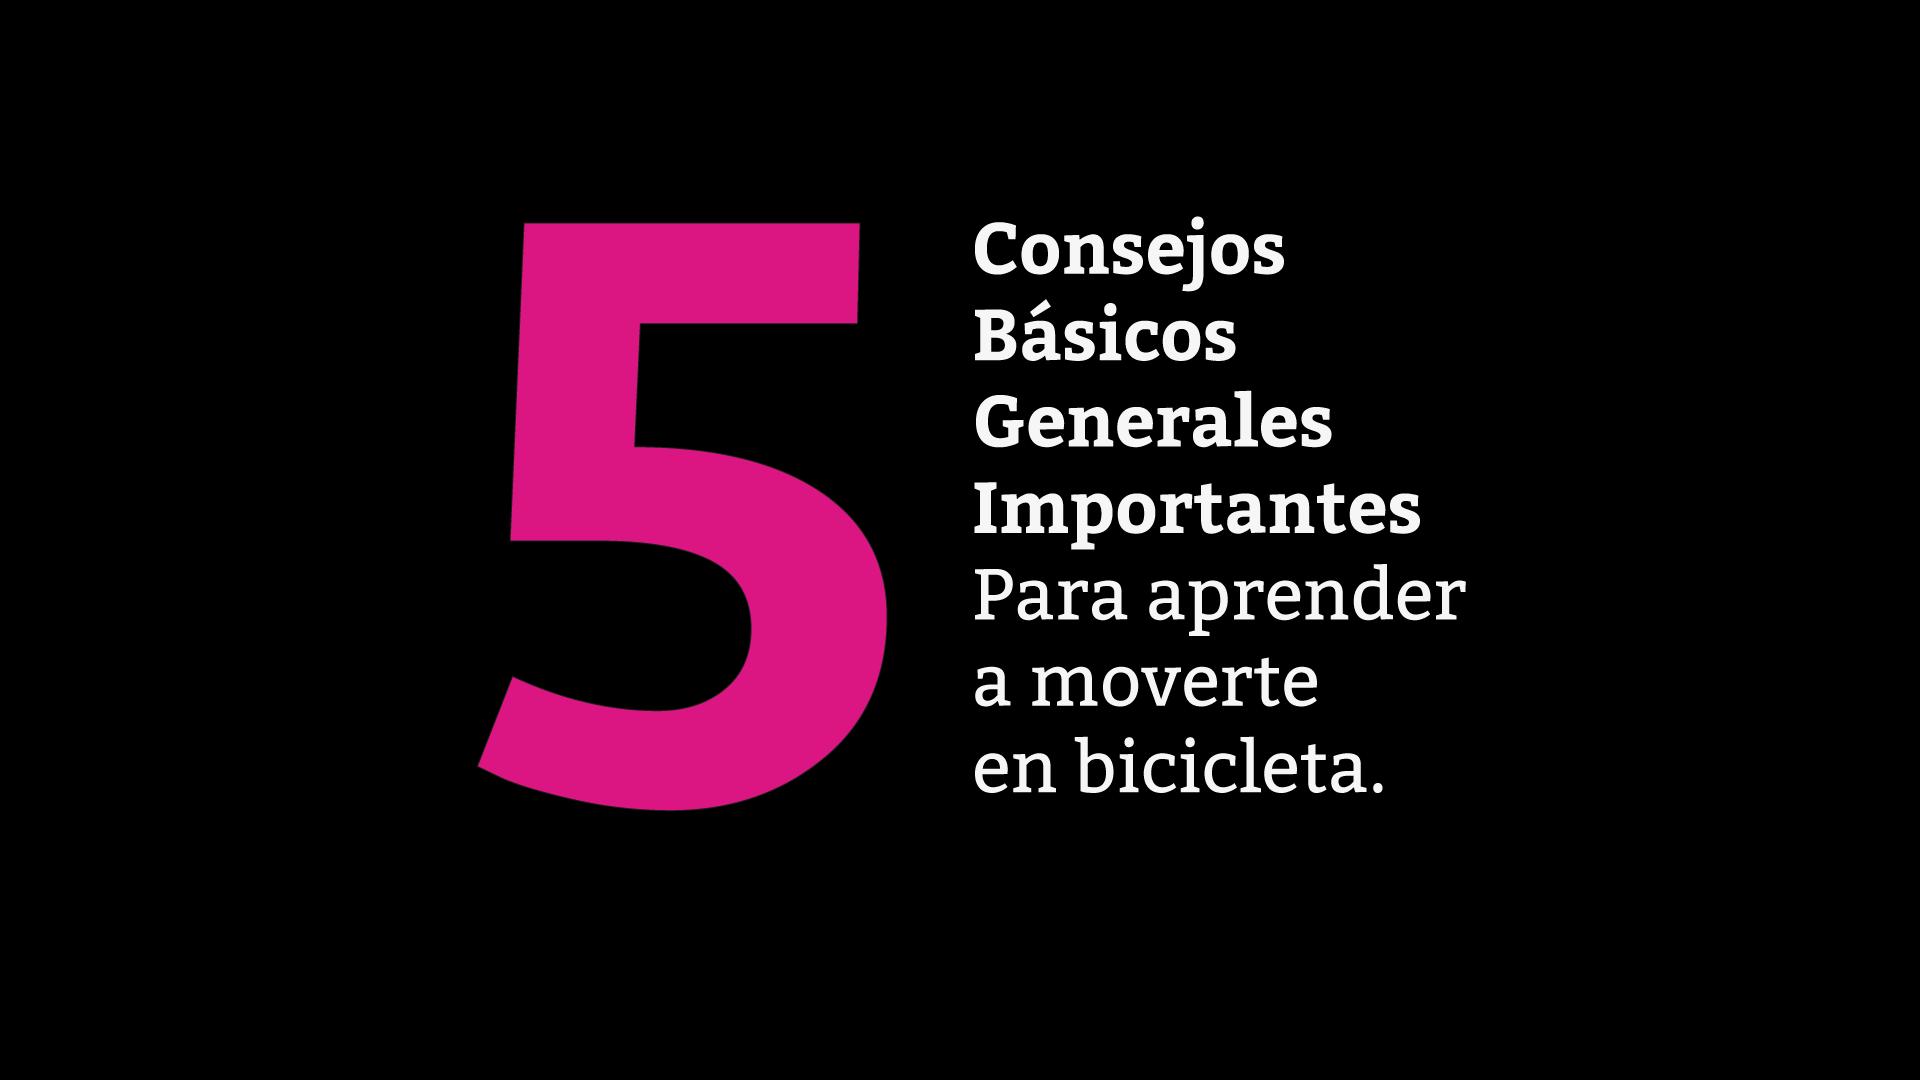 5 consejos para aprender a moverse en bicicleta